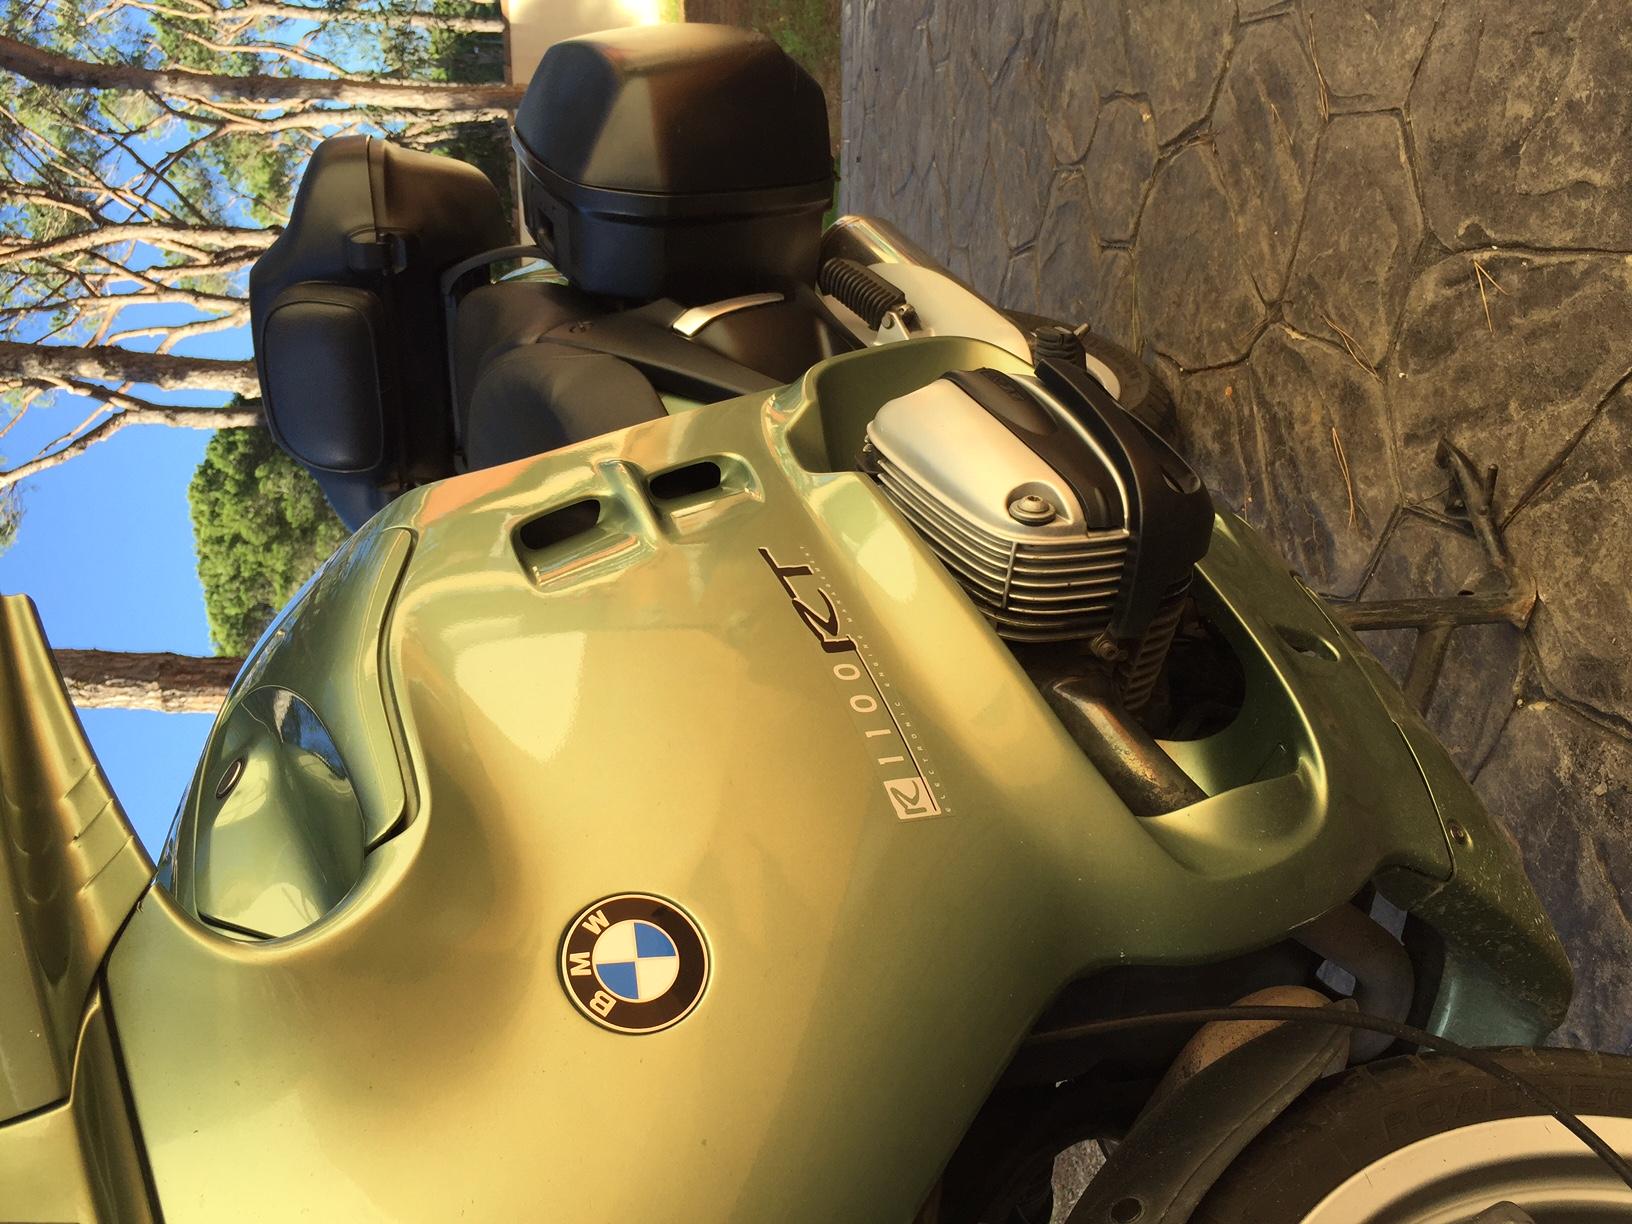 BMW RT 1100